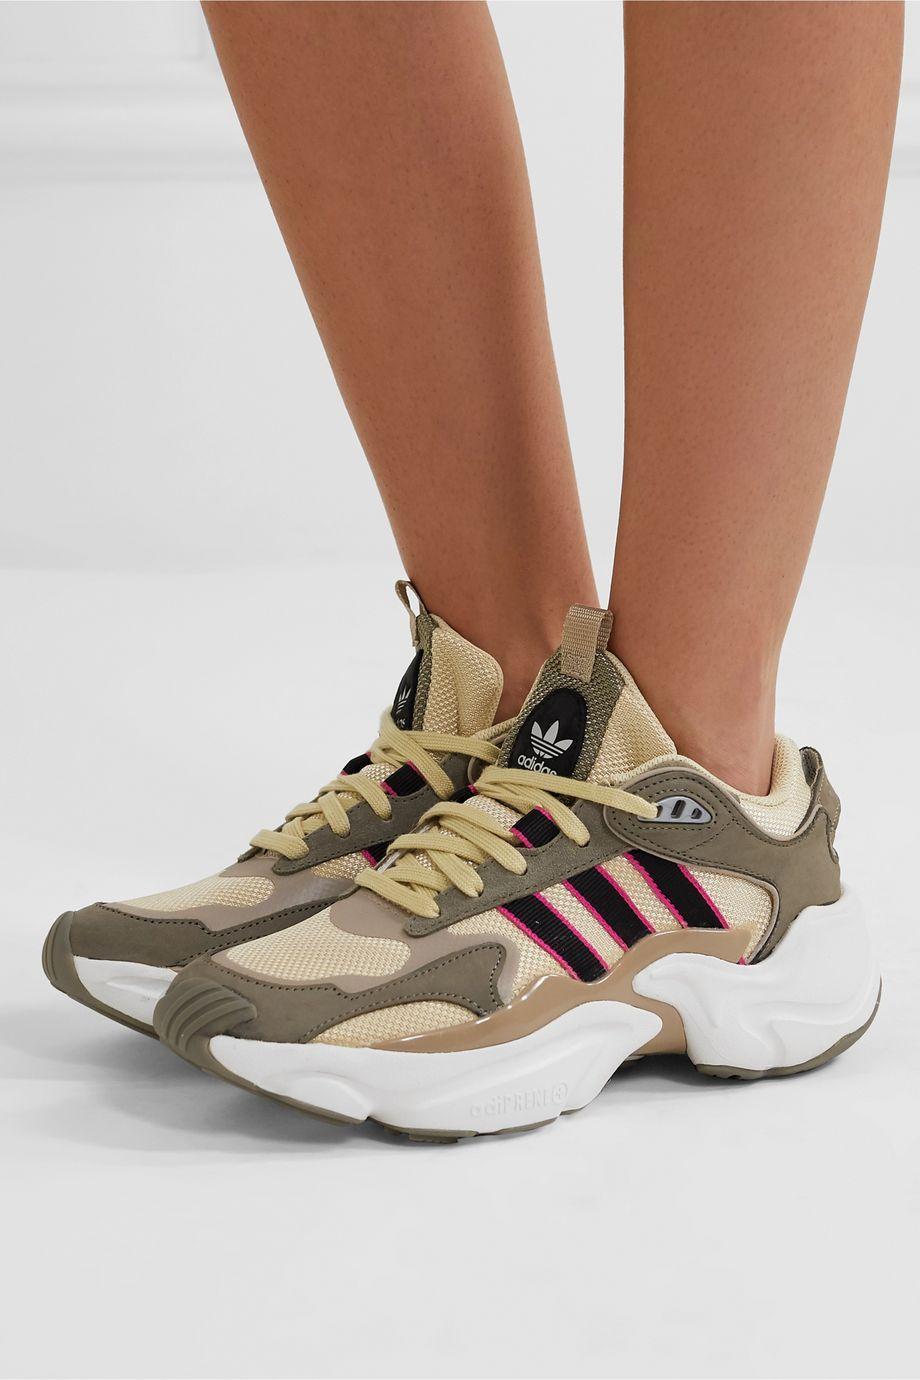 adidas Originals Magmur Runner Sneakers aus Mesh, Veloursleder und Leder